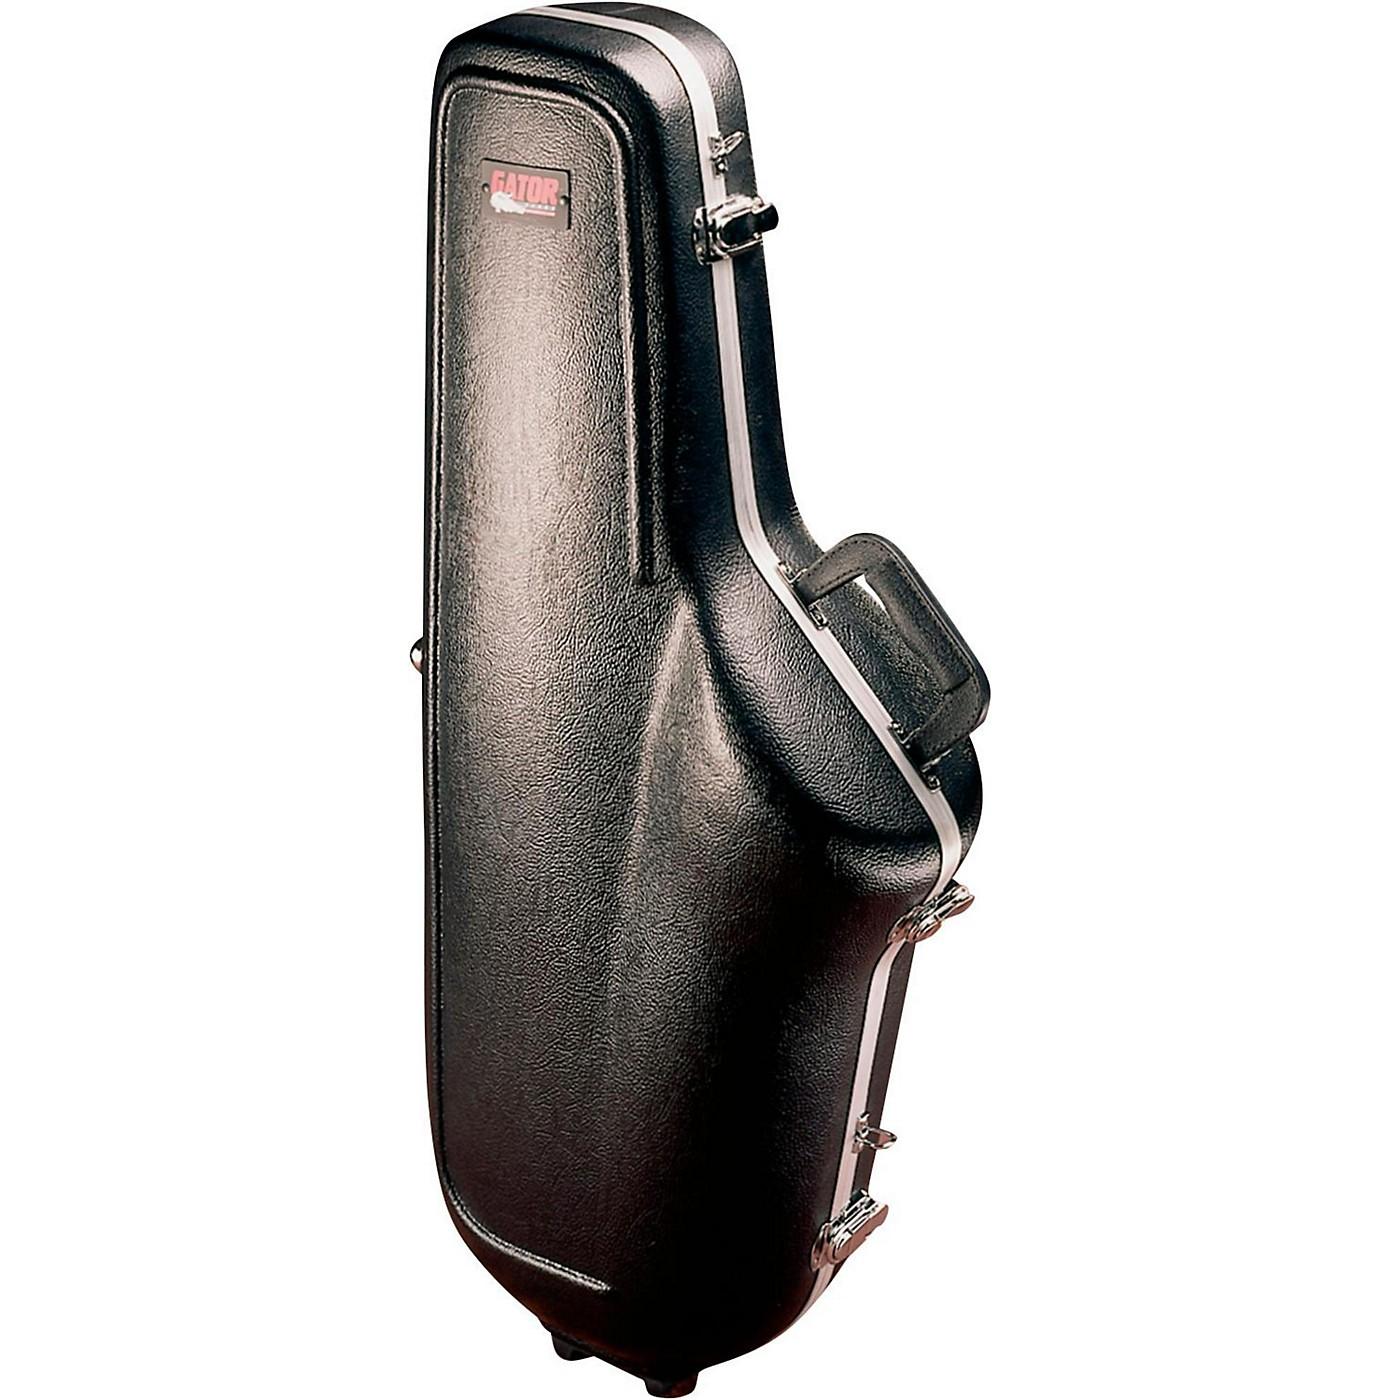 Gator GC Series Deluxe ABS Tenor Saxophone Case thumbnail